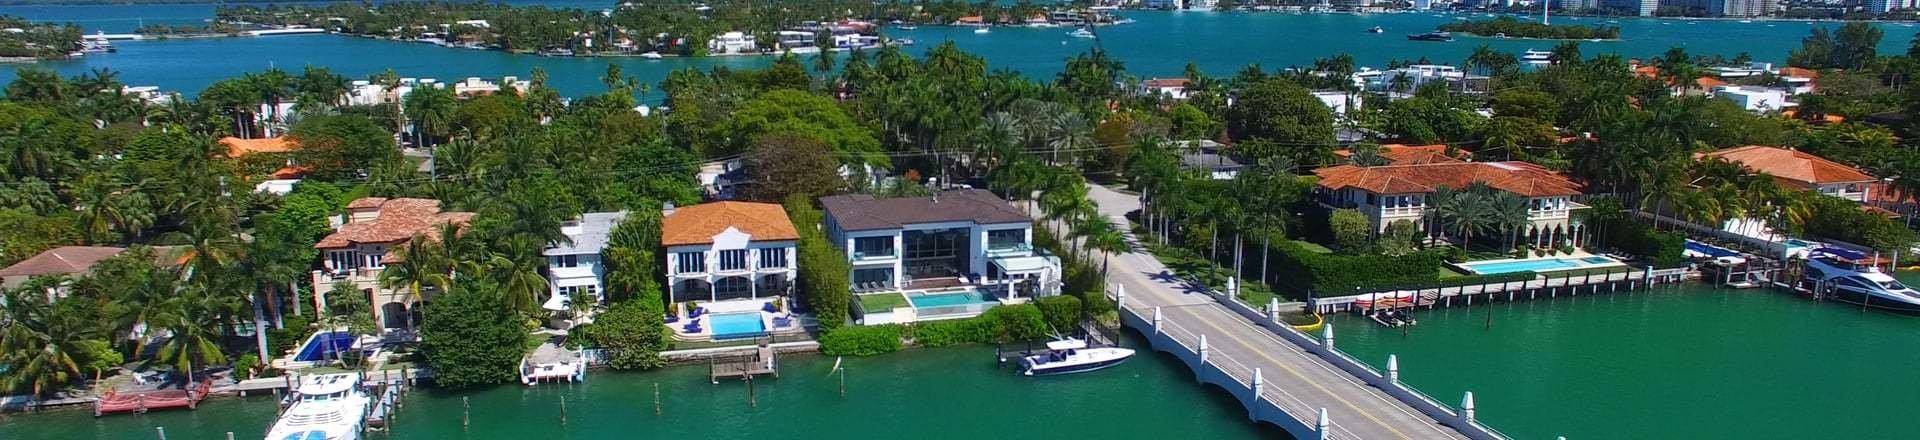 Moderno Playa Uñas Miami Festooning - Ideas de Pintar de Uñas ...